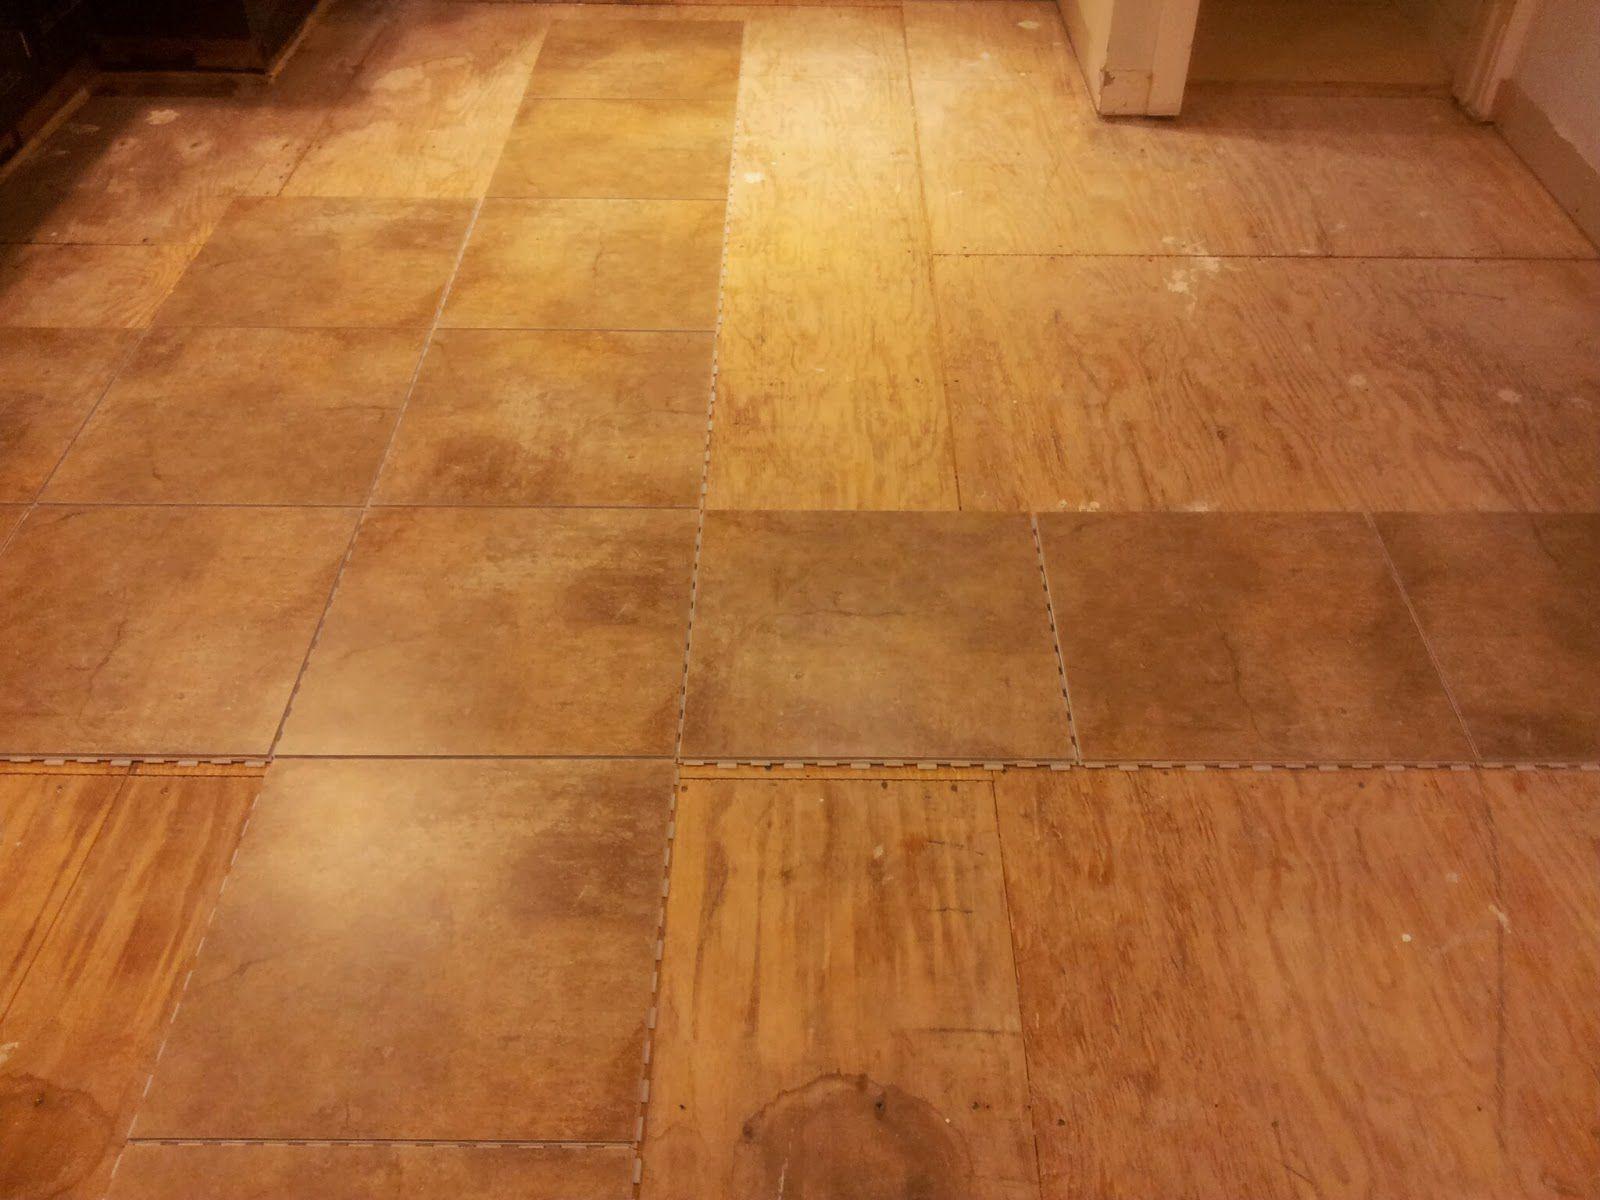 Snapstone Floors Easy Way Lay Ceramic Tile